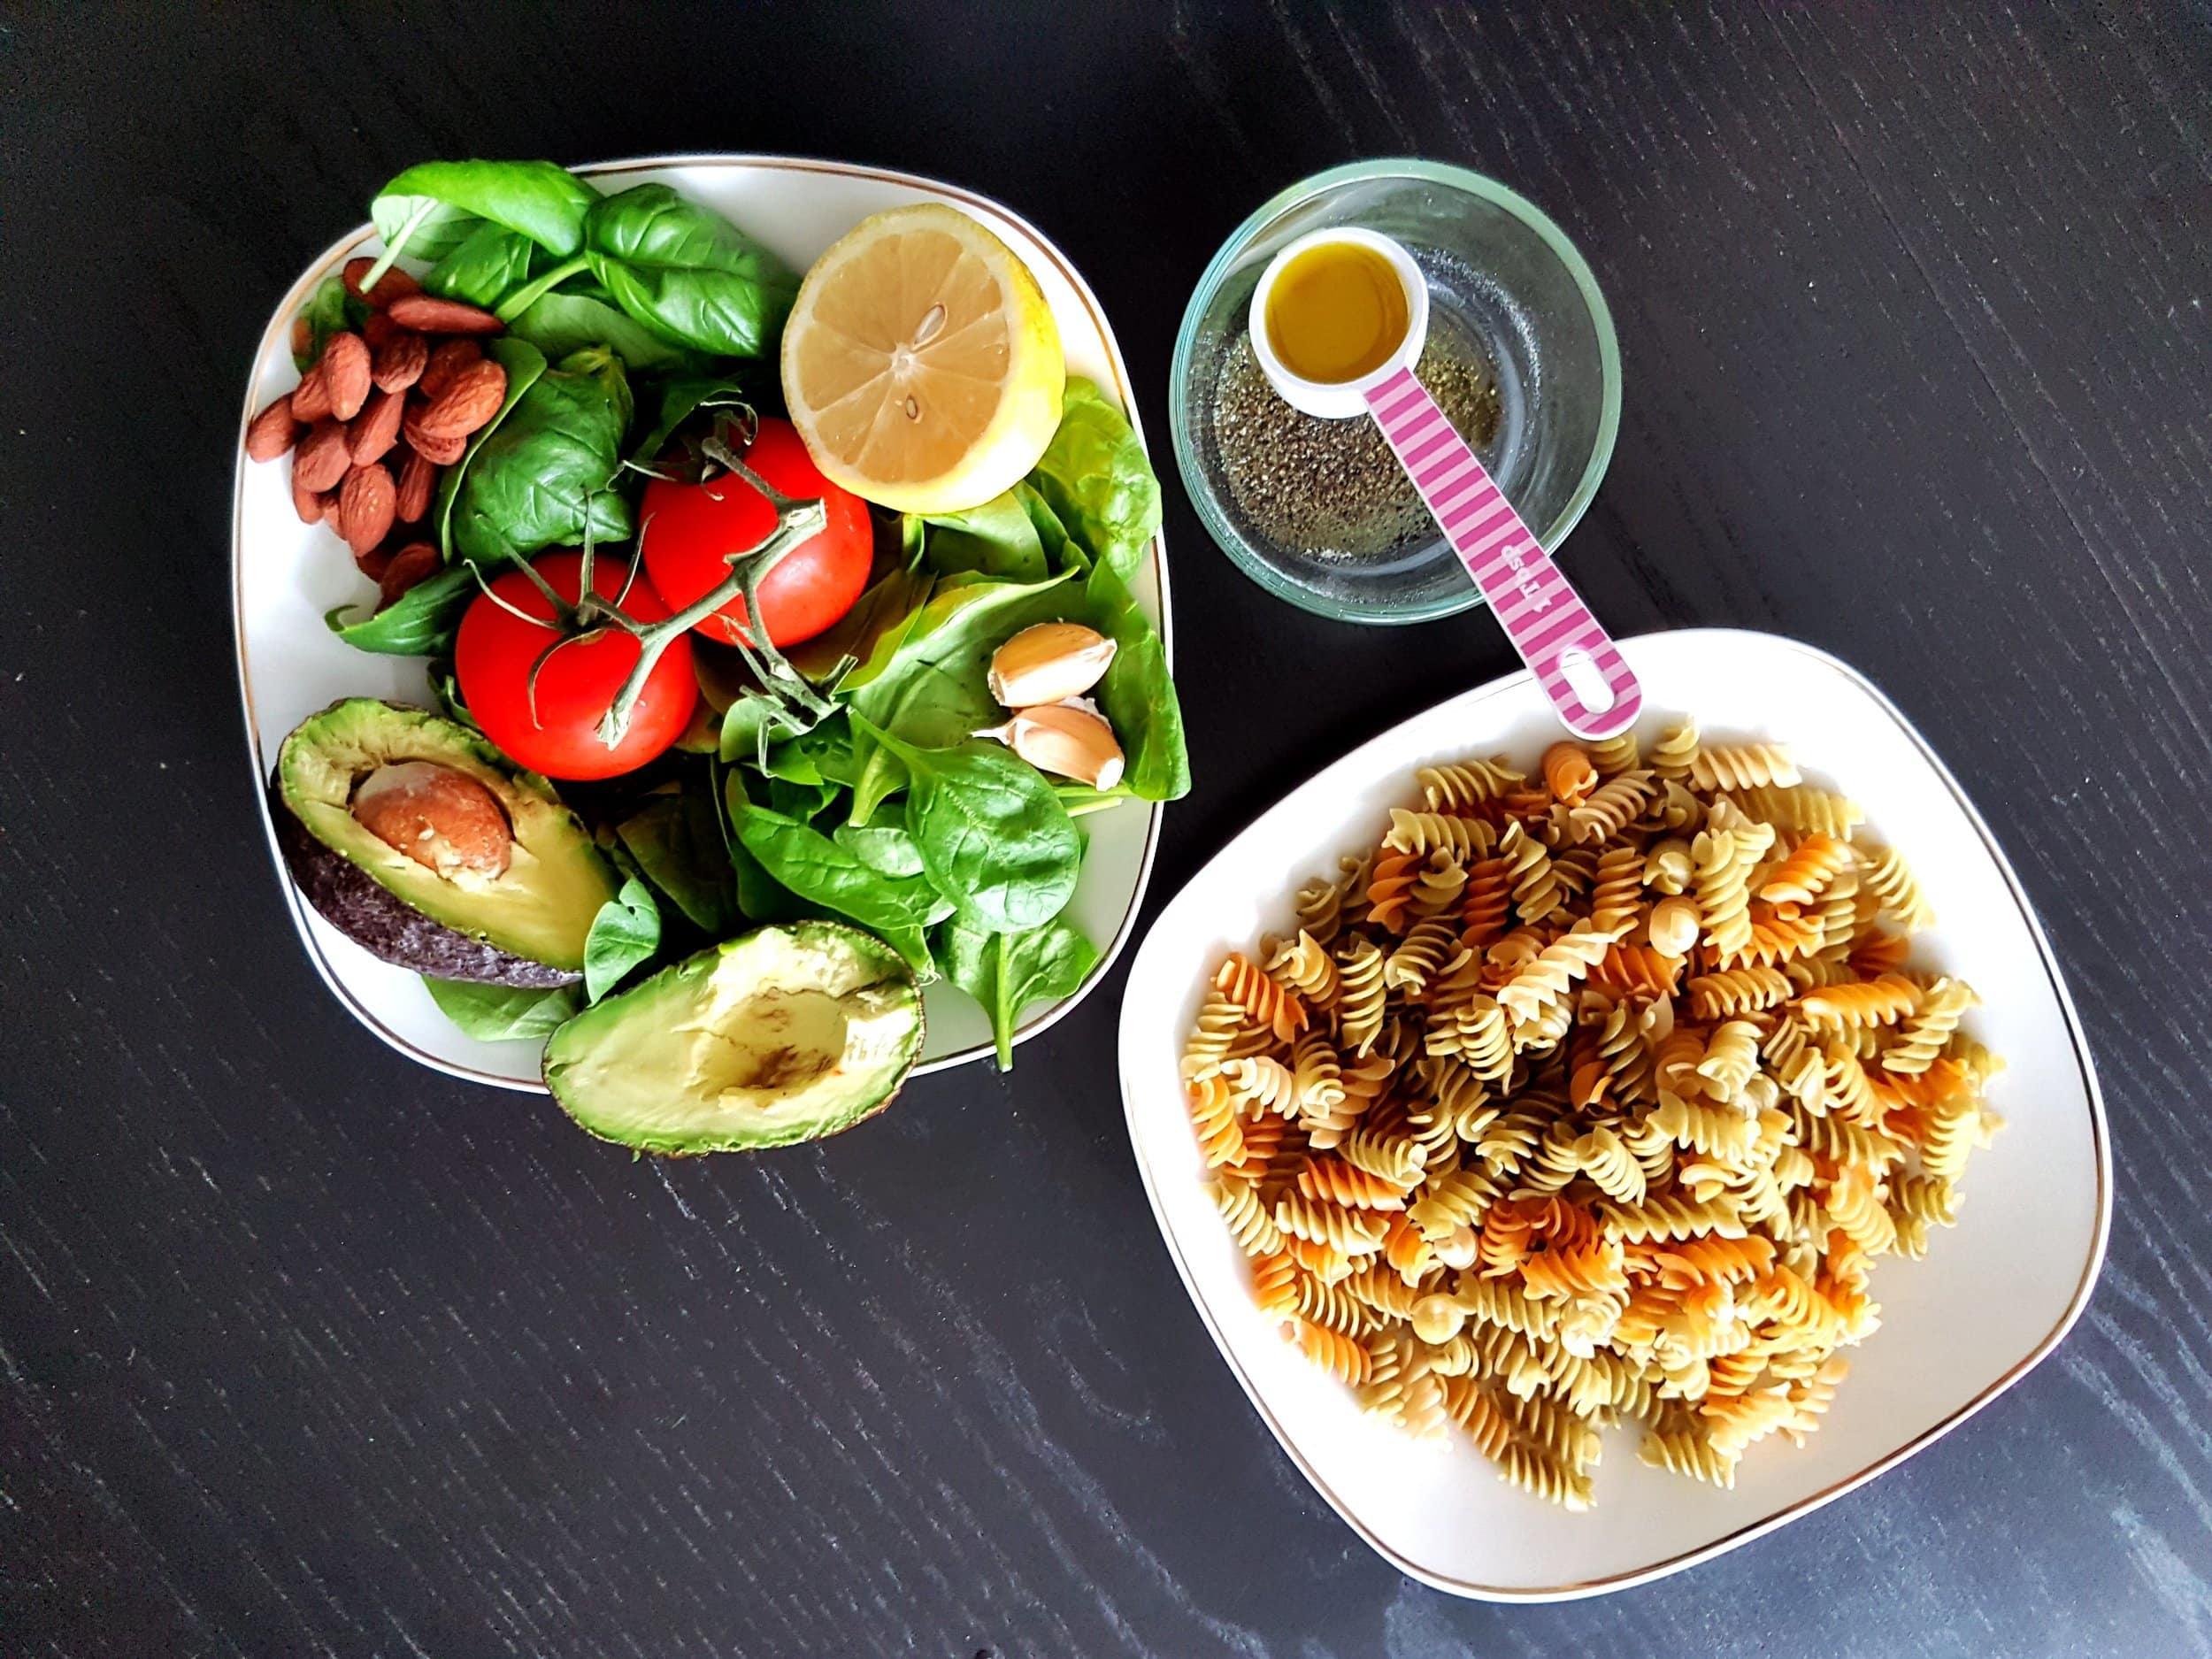 Basil, tomatoes, avocado, pasta, a lemon, almonds, and garlic.